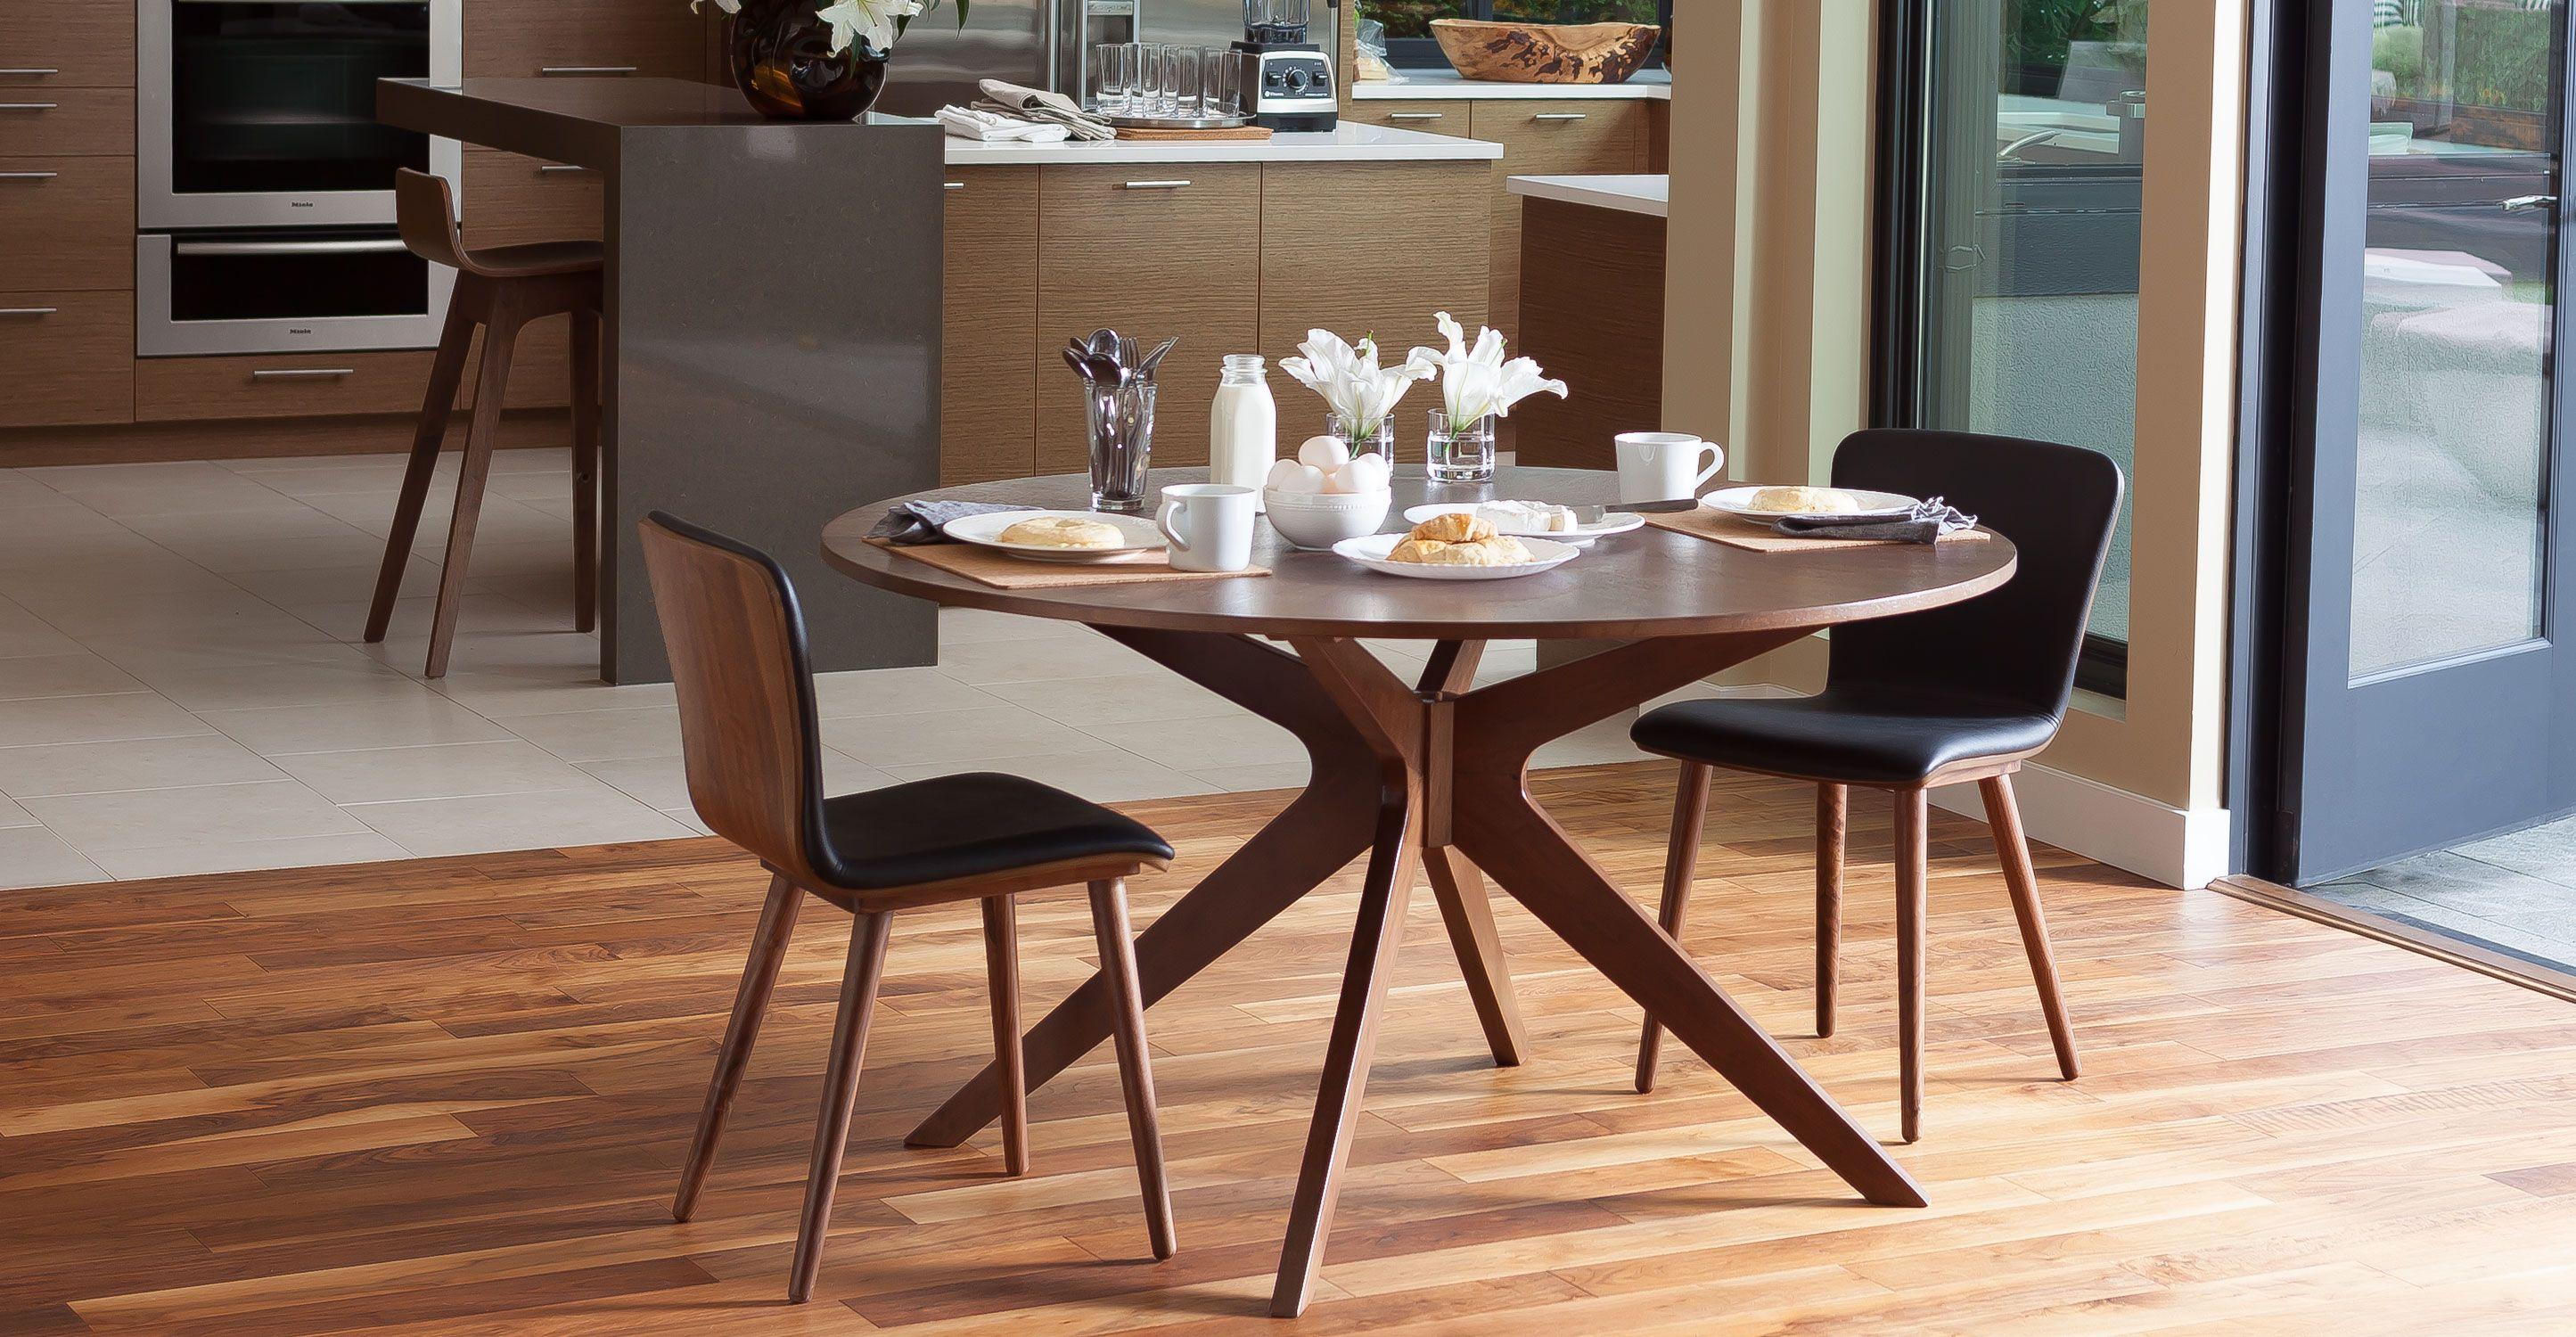 2 x Gray Mid-Century Modern Dining Chair In Walnut Wood ...